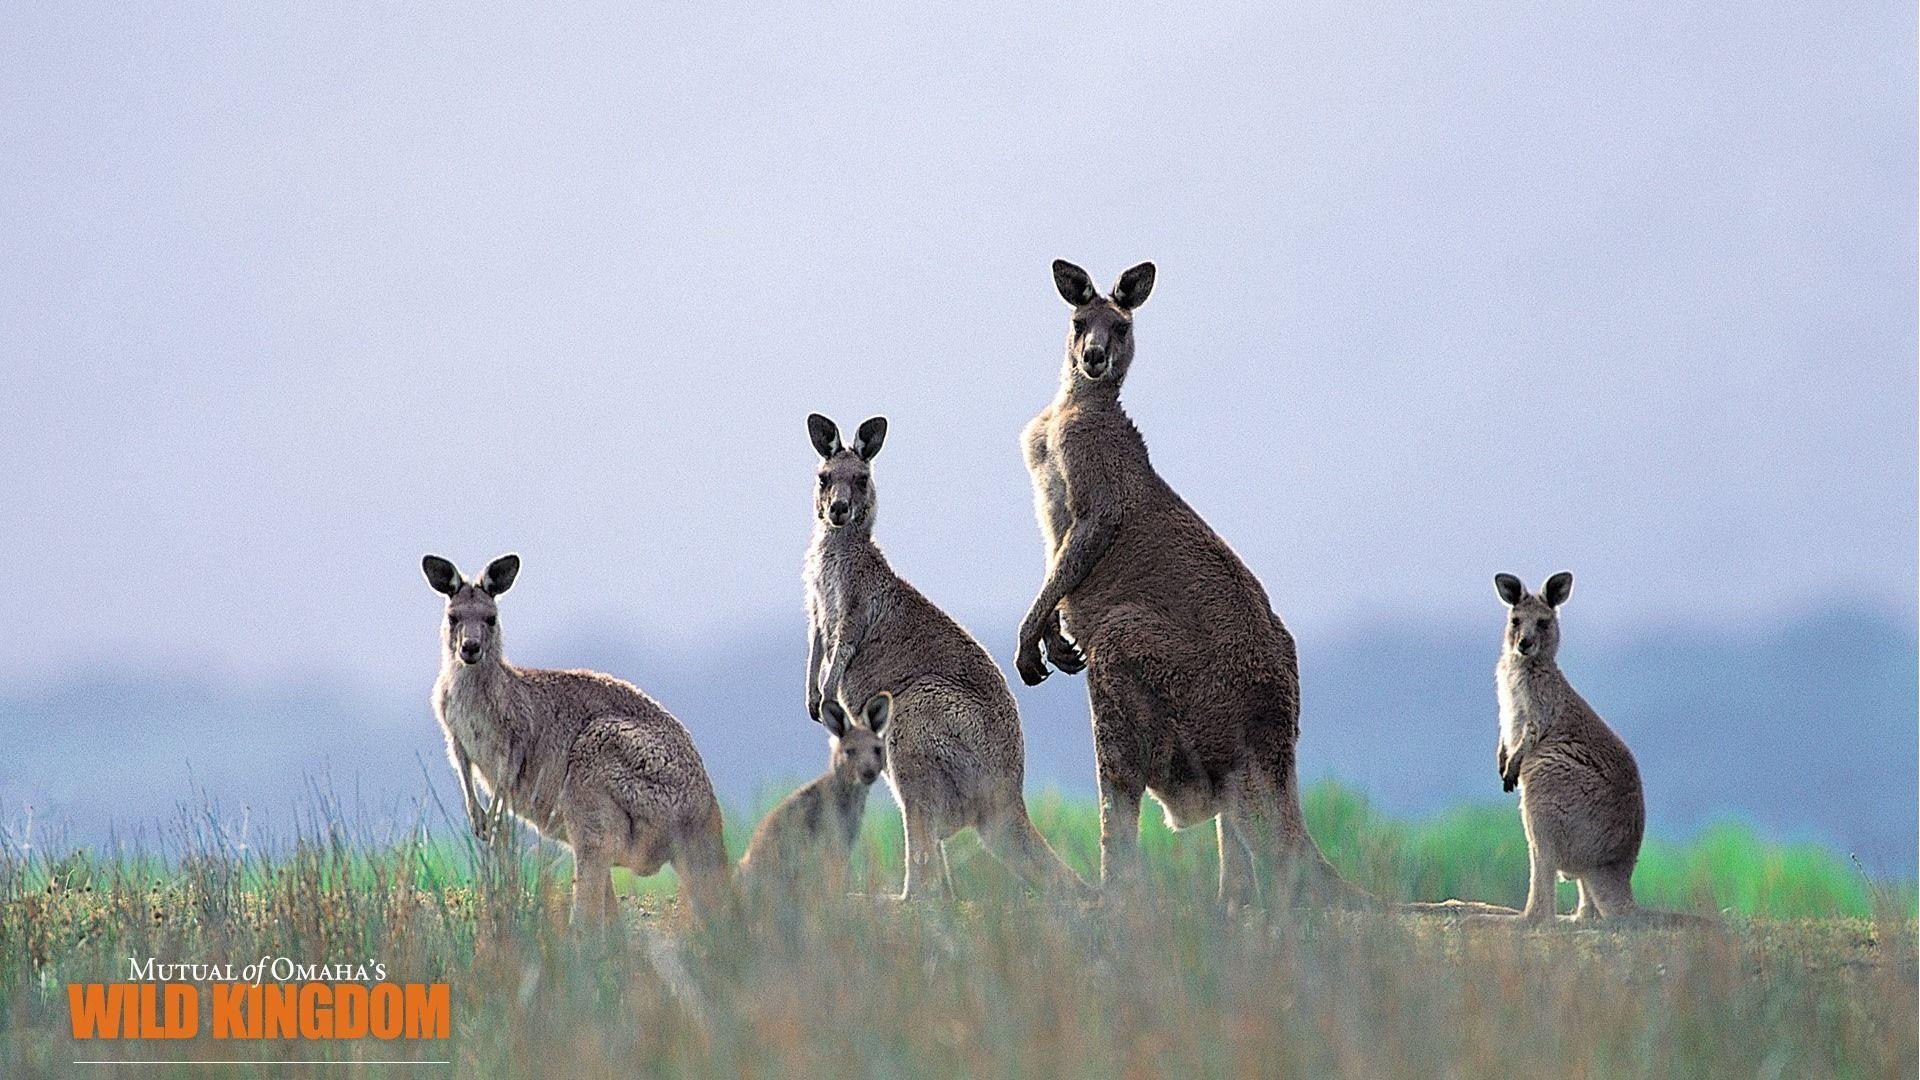 Kangaroo Wallpaper - 1920x1080 wallpaper download -